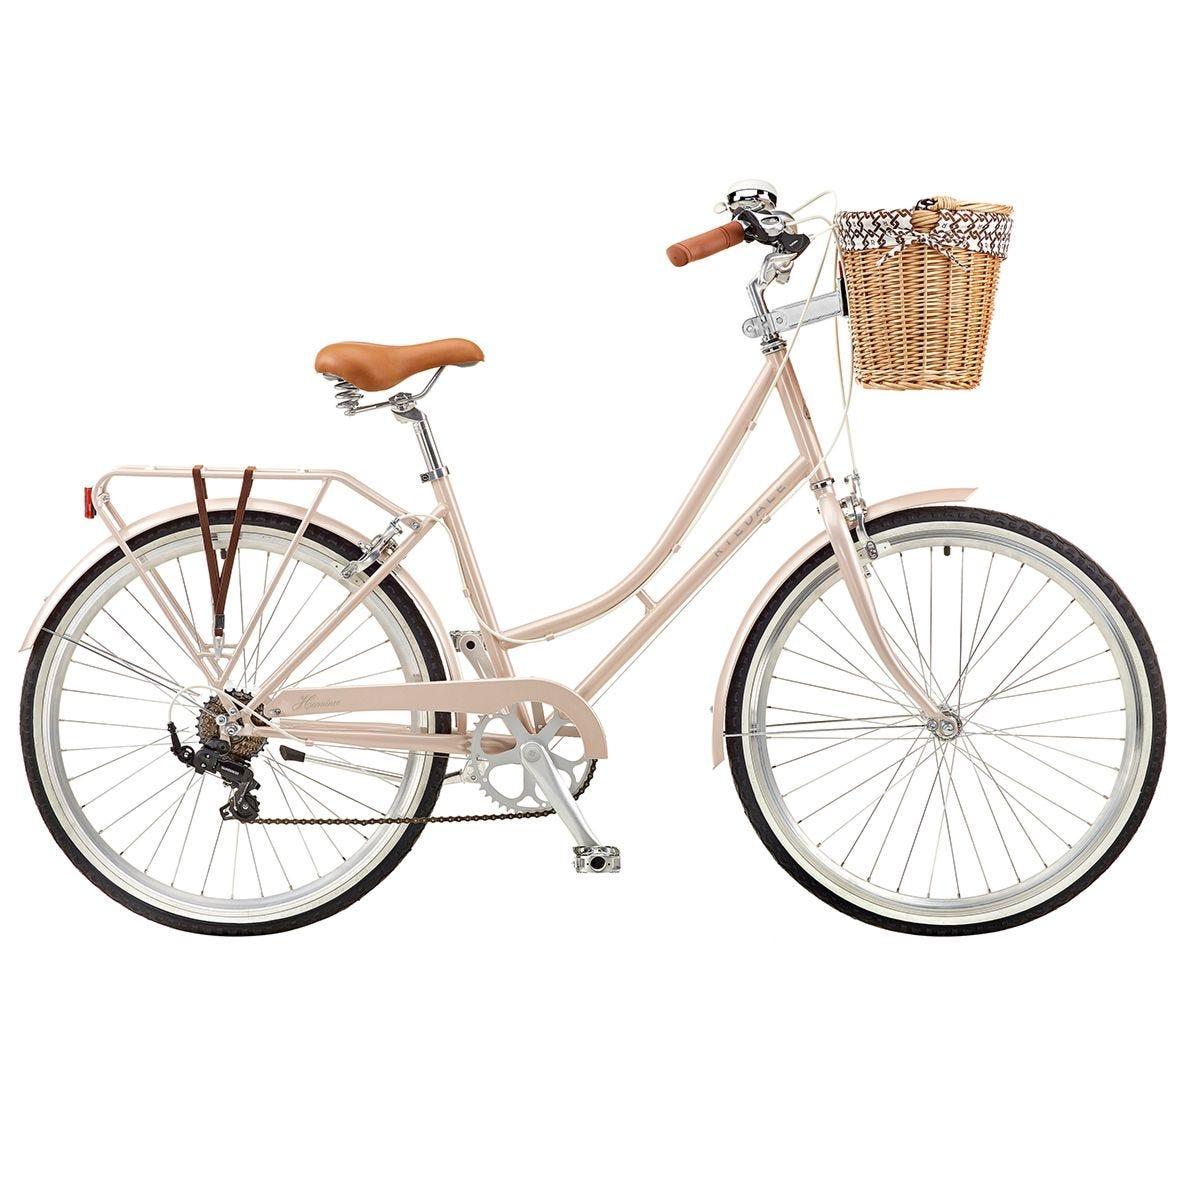 Ryedale Hermione 26 Inch Wheel 19 Inch Frame 7 Speed Ladies Heritage Bike - Rose Gold